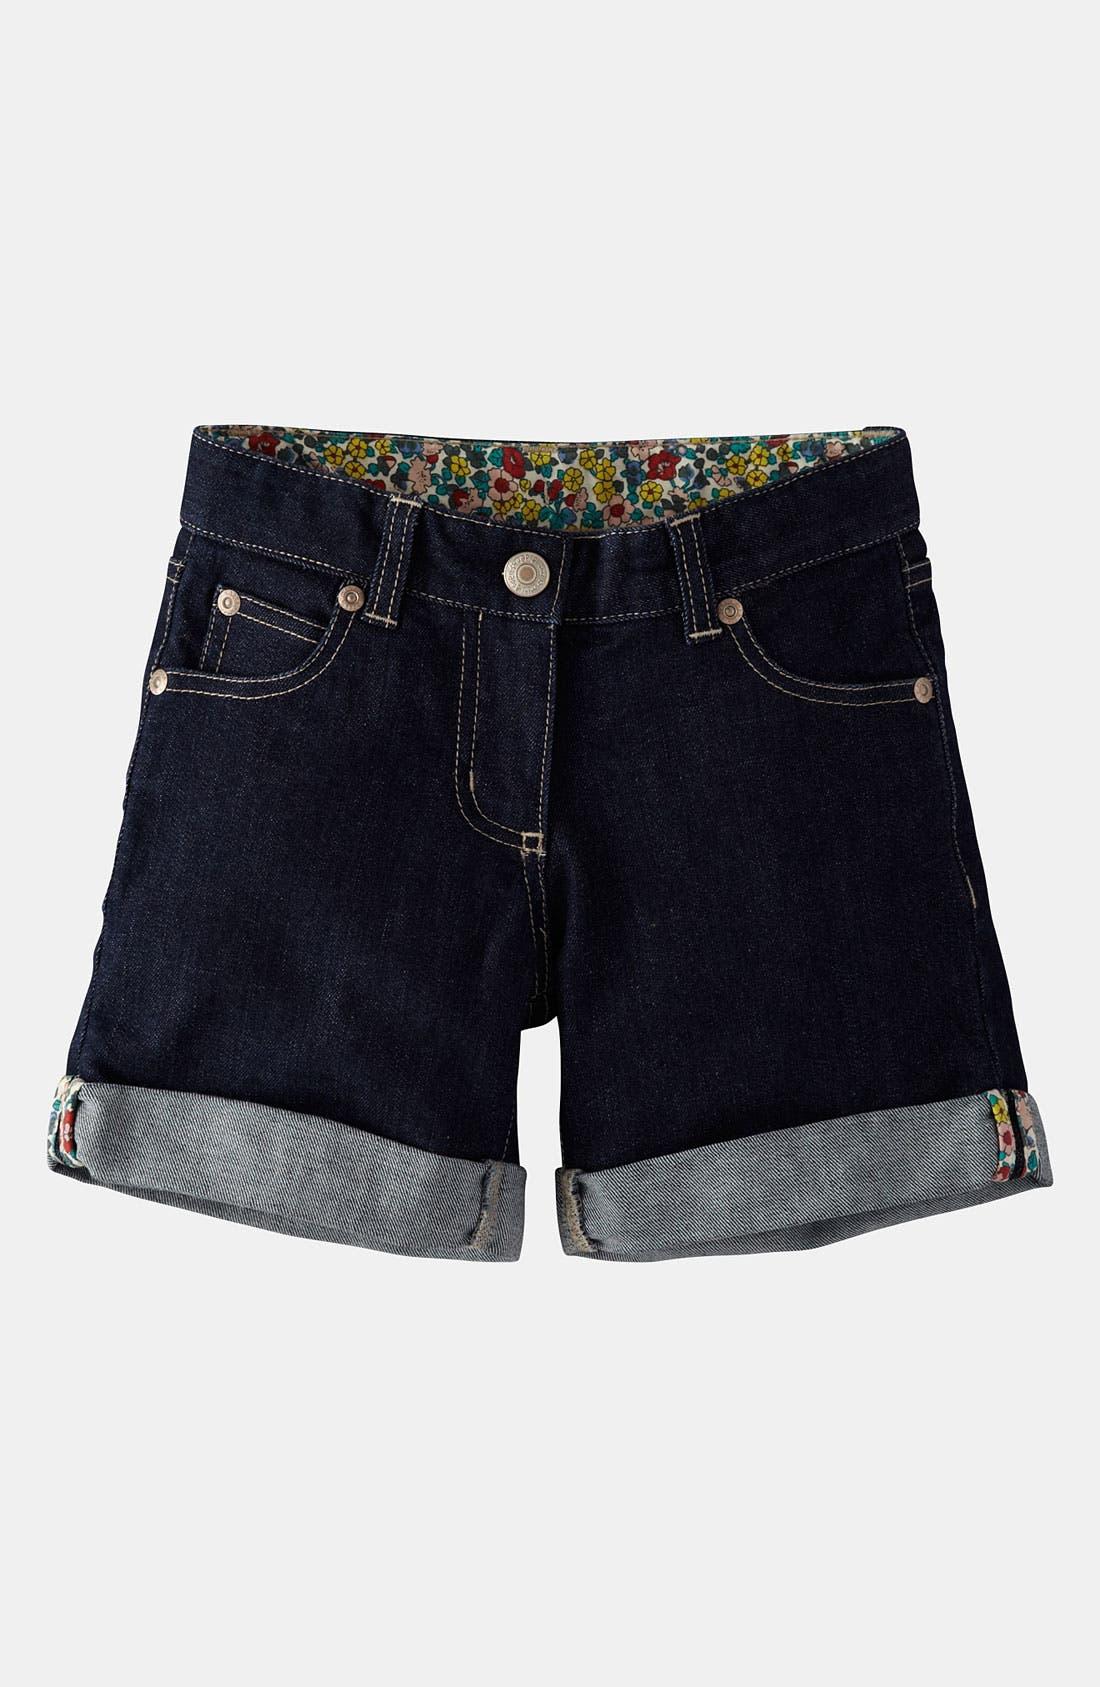 Alternate Image 1 Selected - Mini Boden 'Roll Up' Shorts (Little Girls & Big Girls)